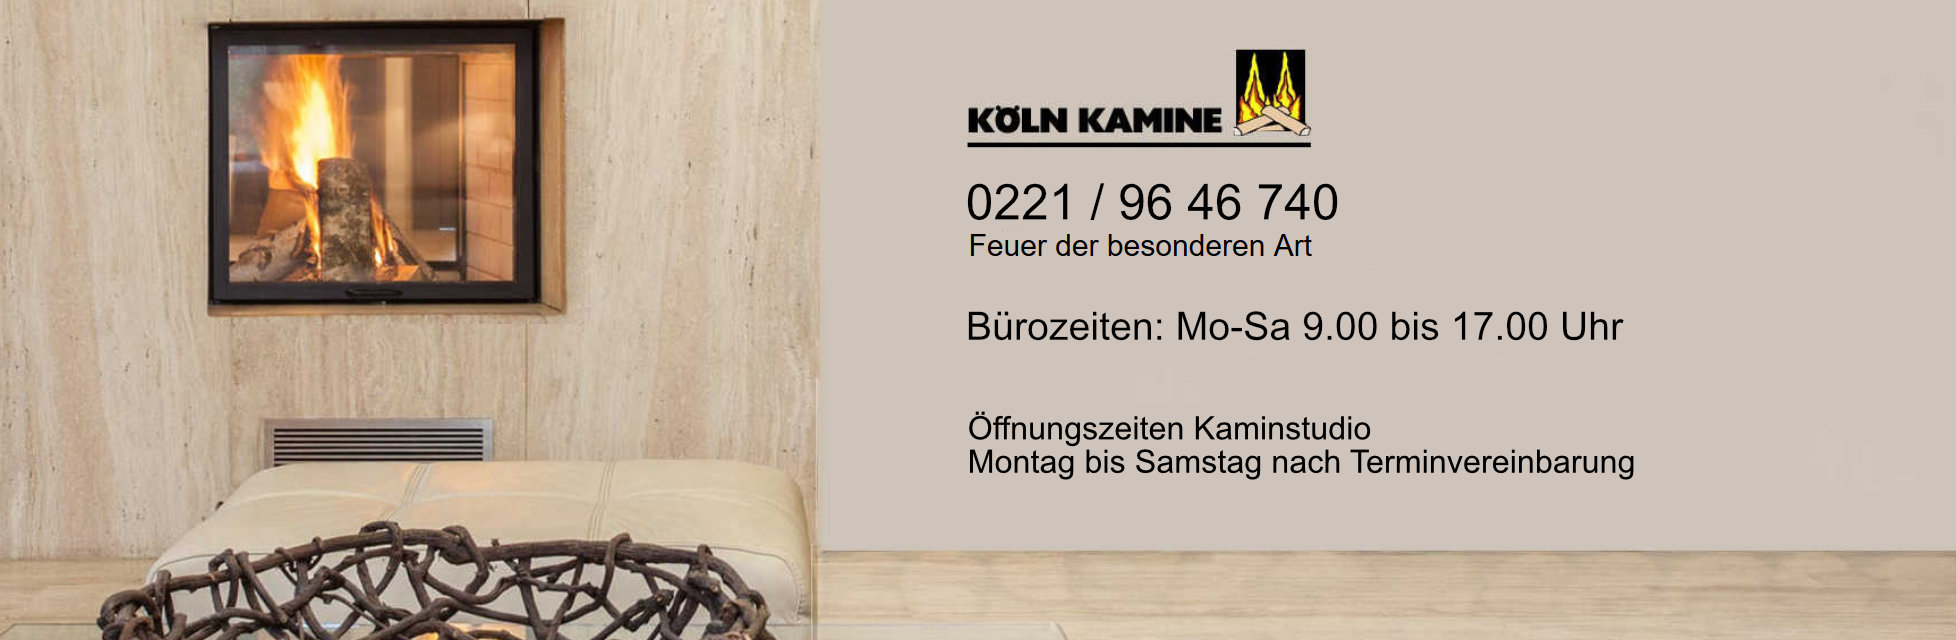 Köln Kamine